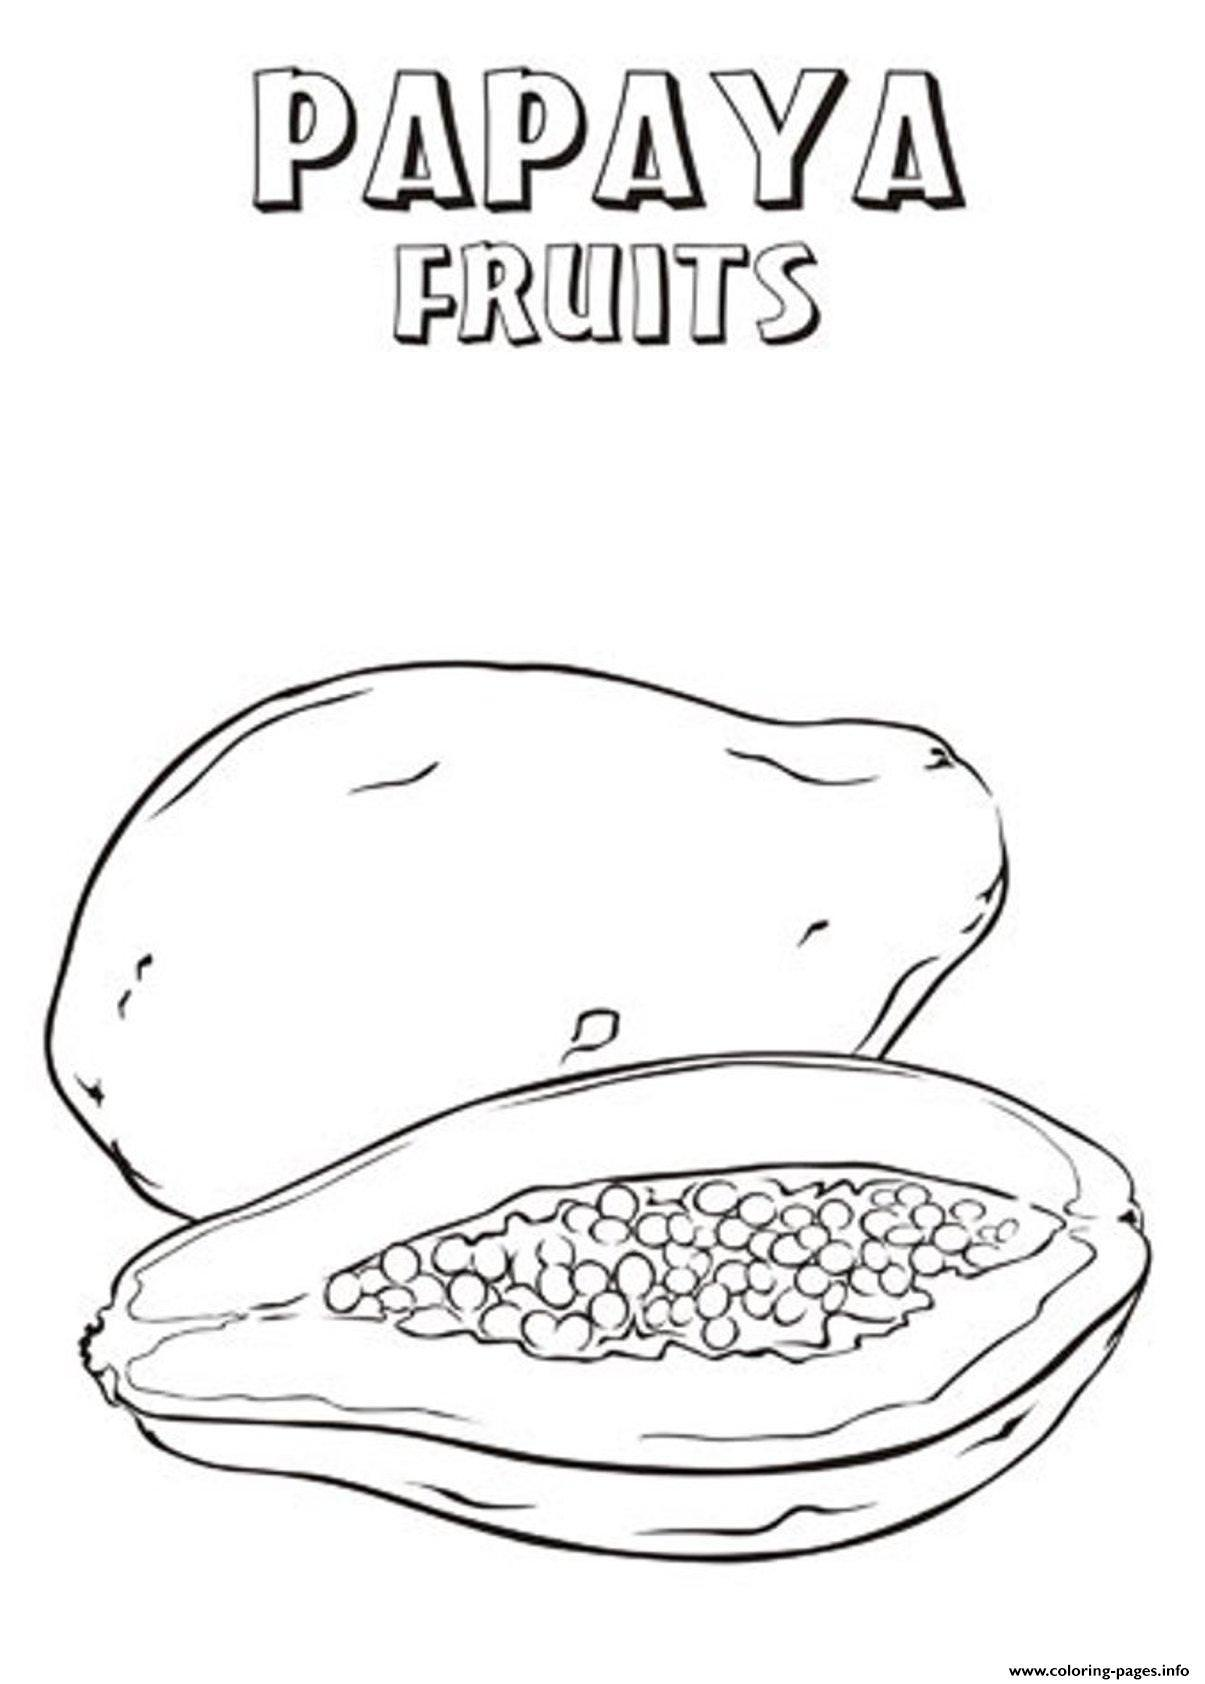 1205x1684 Papaya Fruit Coloring Pages